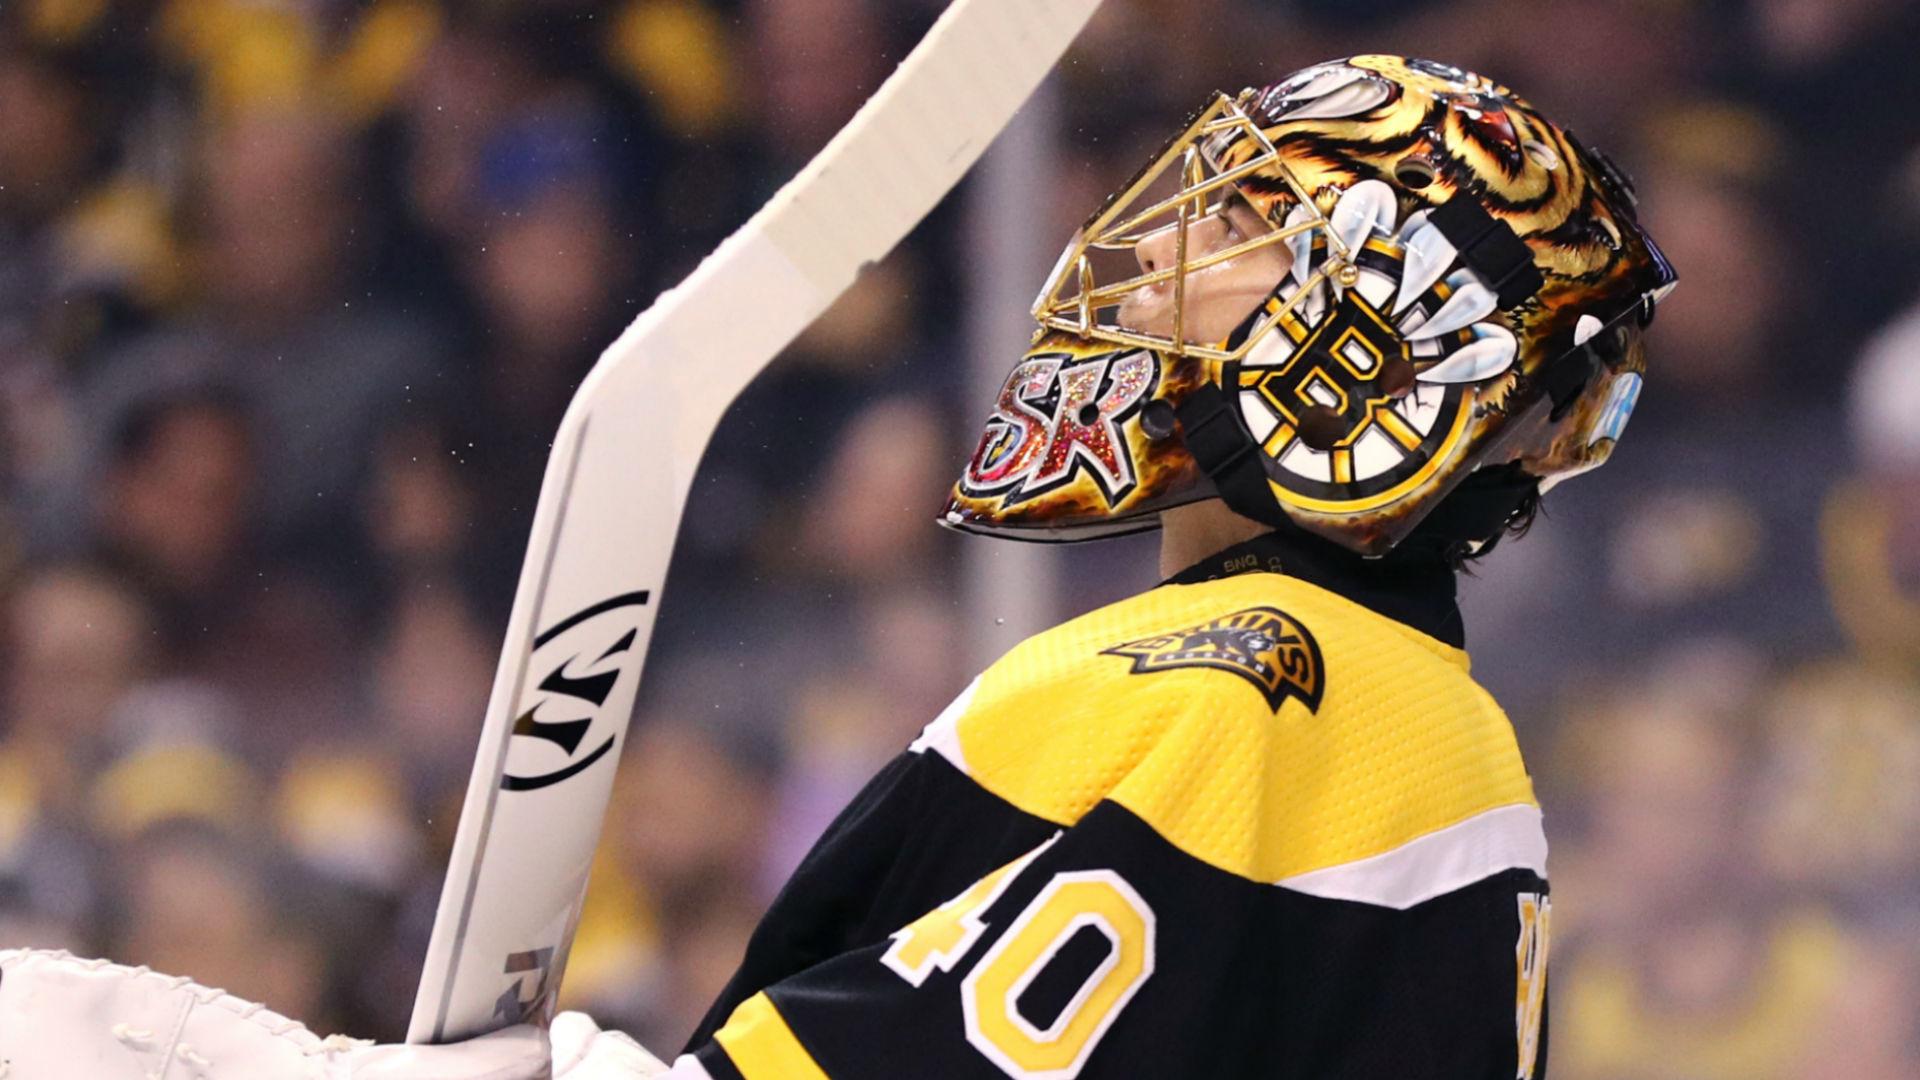 Nhl Rumor Roundup Should The Bruins Shop Tuukka Rask Sporting News